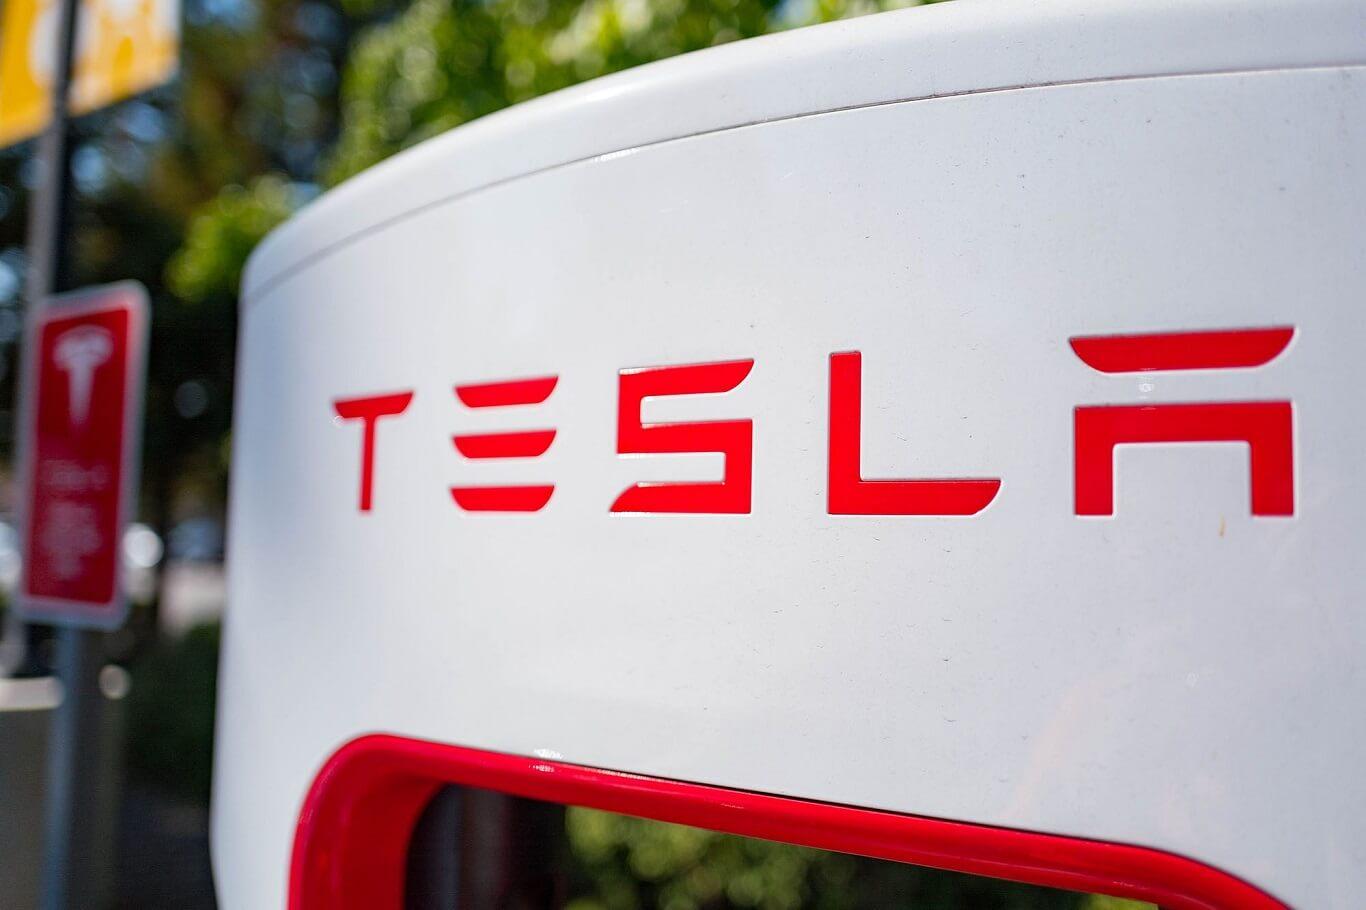 Tesla's expansion plans